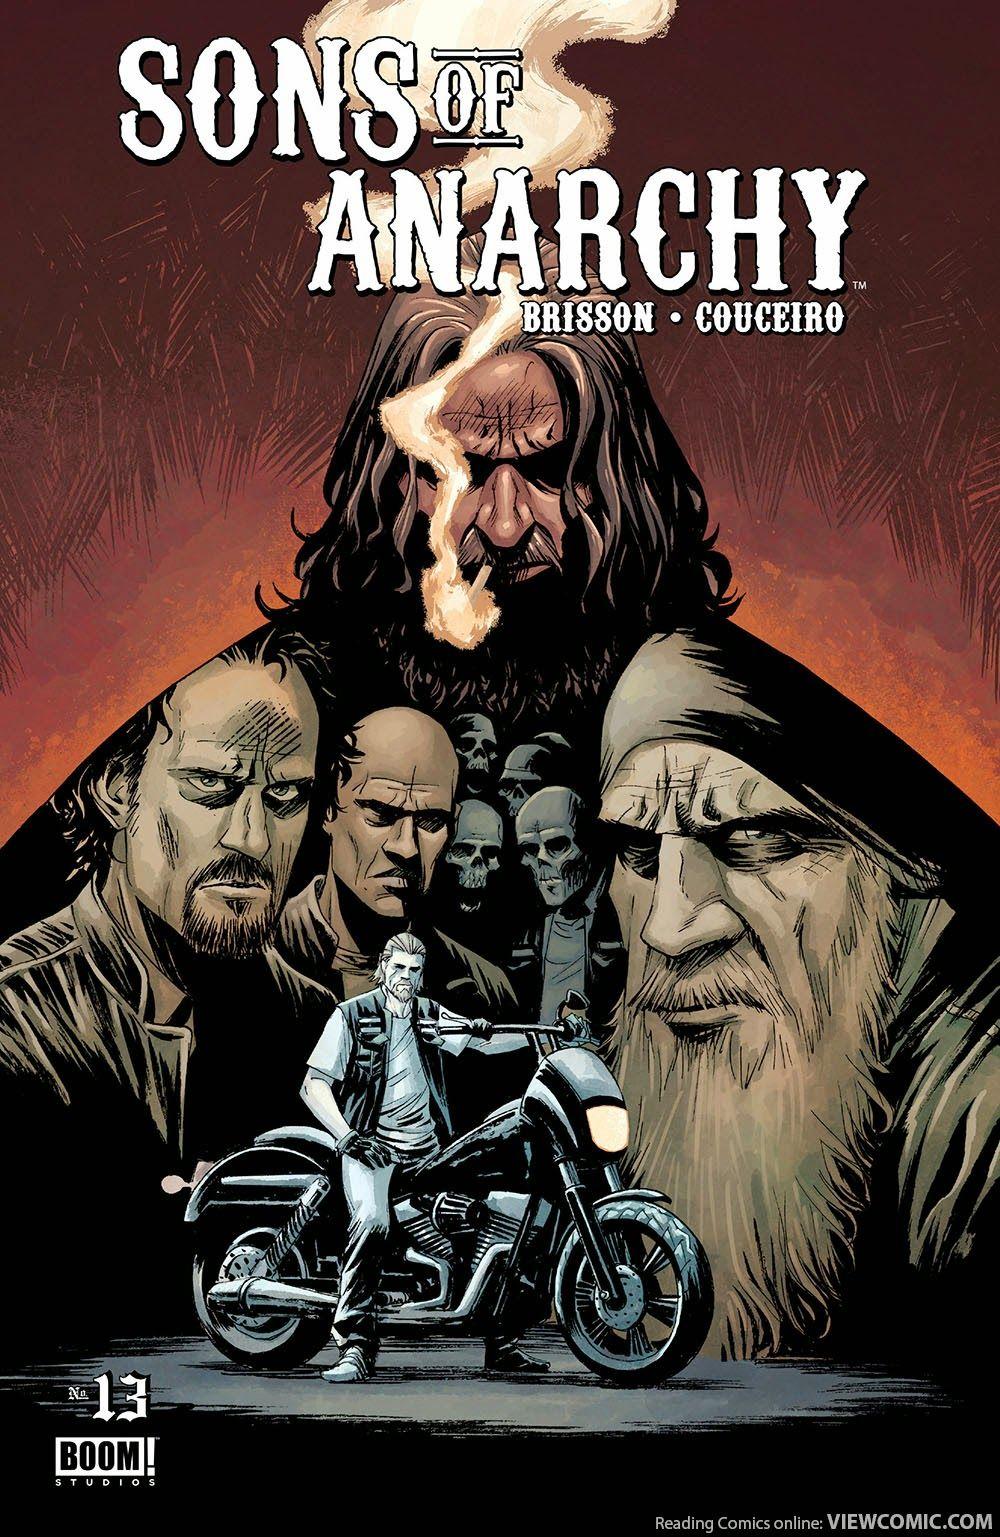 Sons Of Anarchy 013 2014 Viewcomic Reading Comics Online For Free 2019 Sons Of Anarchy Anarchy Sons Of Anarchy Samcro